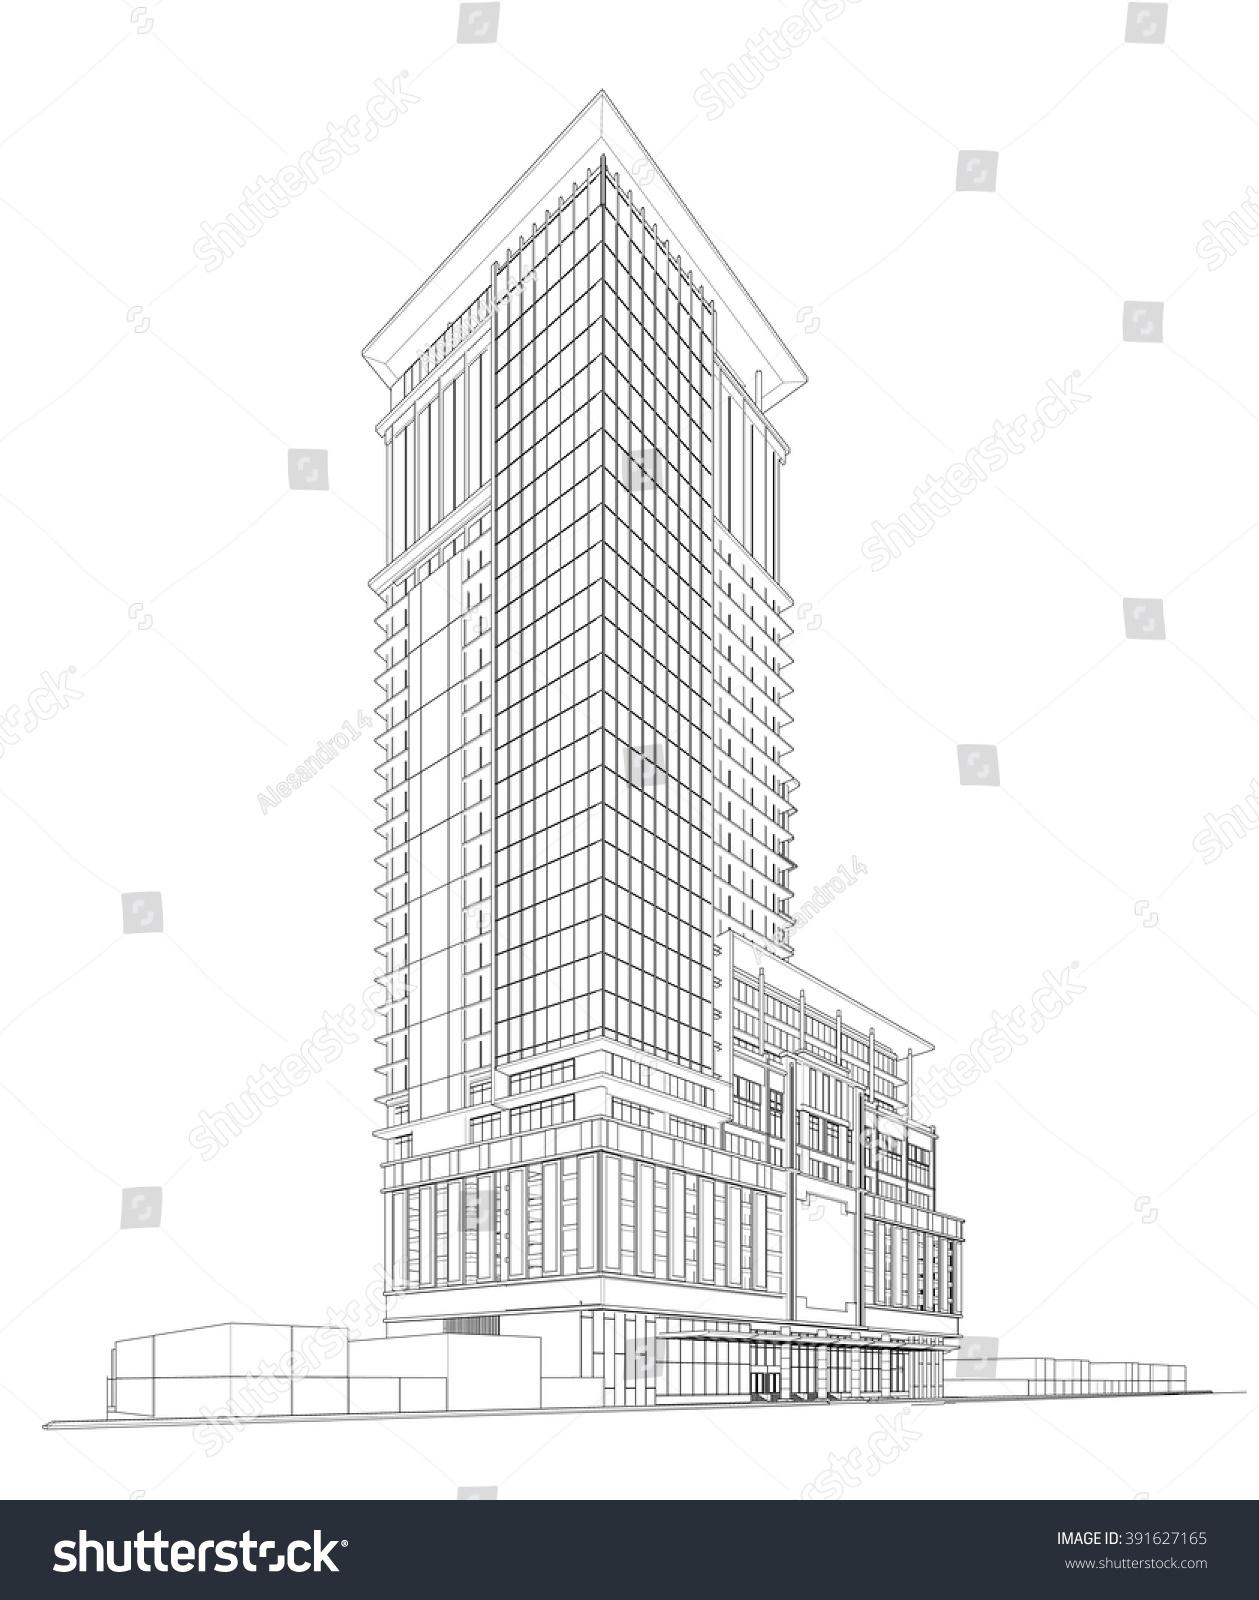 perspective 3 d render building wireframe のベクター画像素材